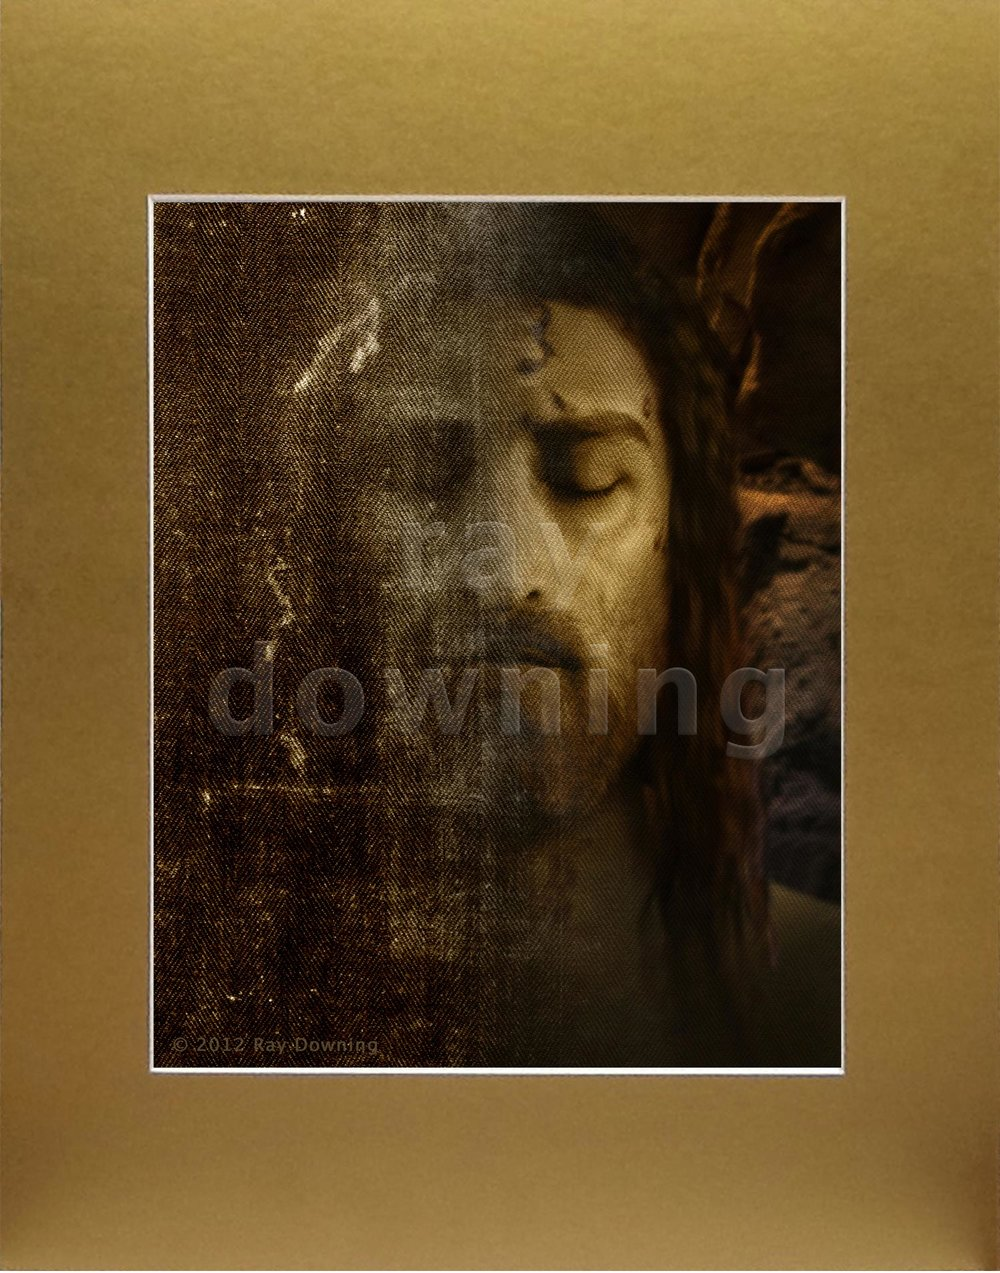 jesus-pictures-shroud-of-turin.jpg